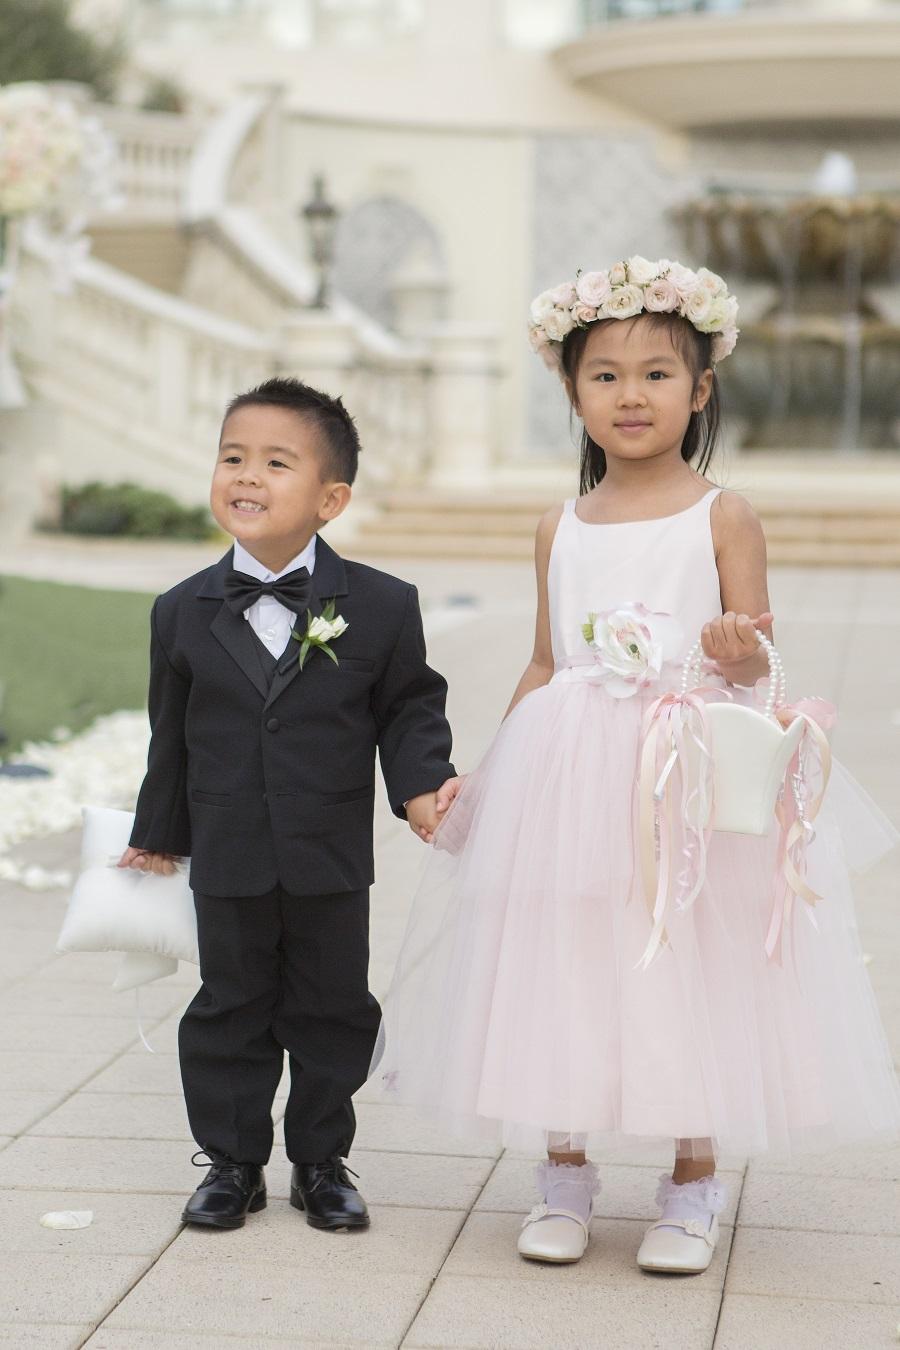 Monarch Beach Resort Wedding, Flowers By Cina, Me Weddings & Events, Christine Bentley Photography, Blush Wedding, Ivory Wedding, Seaside Wedding